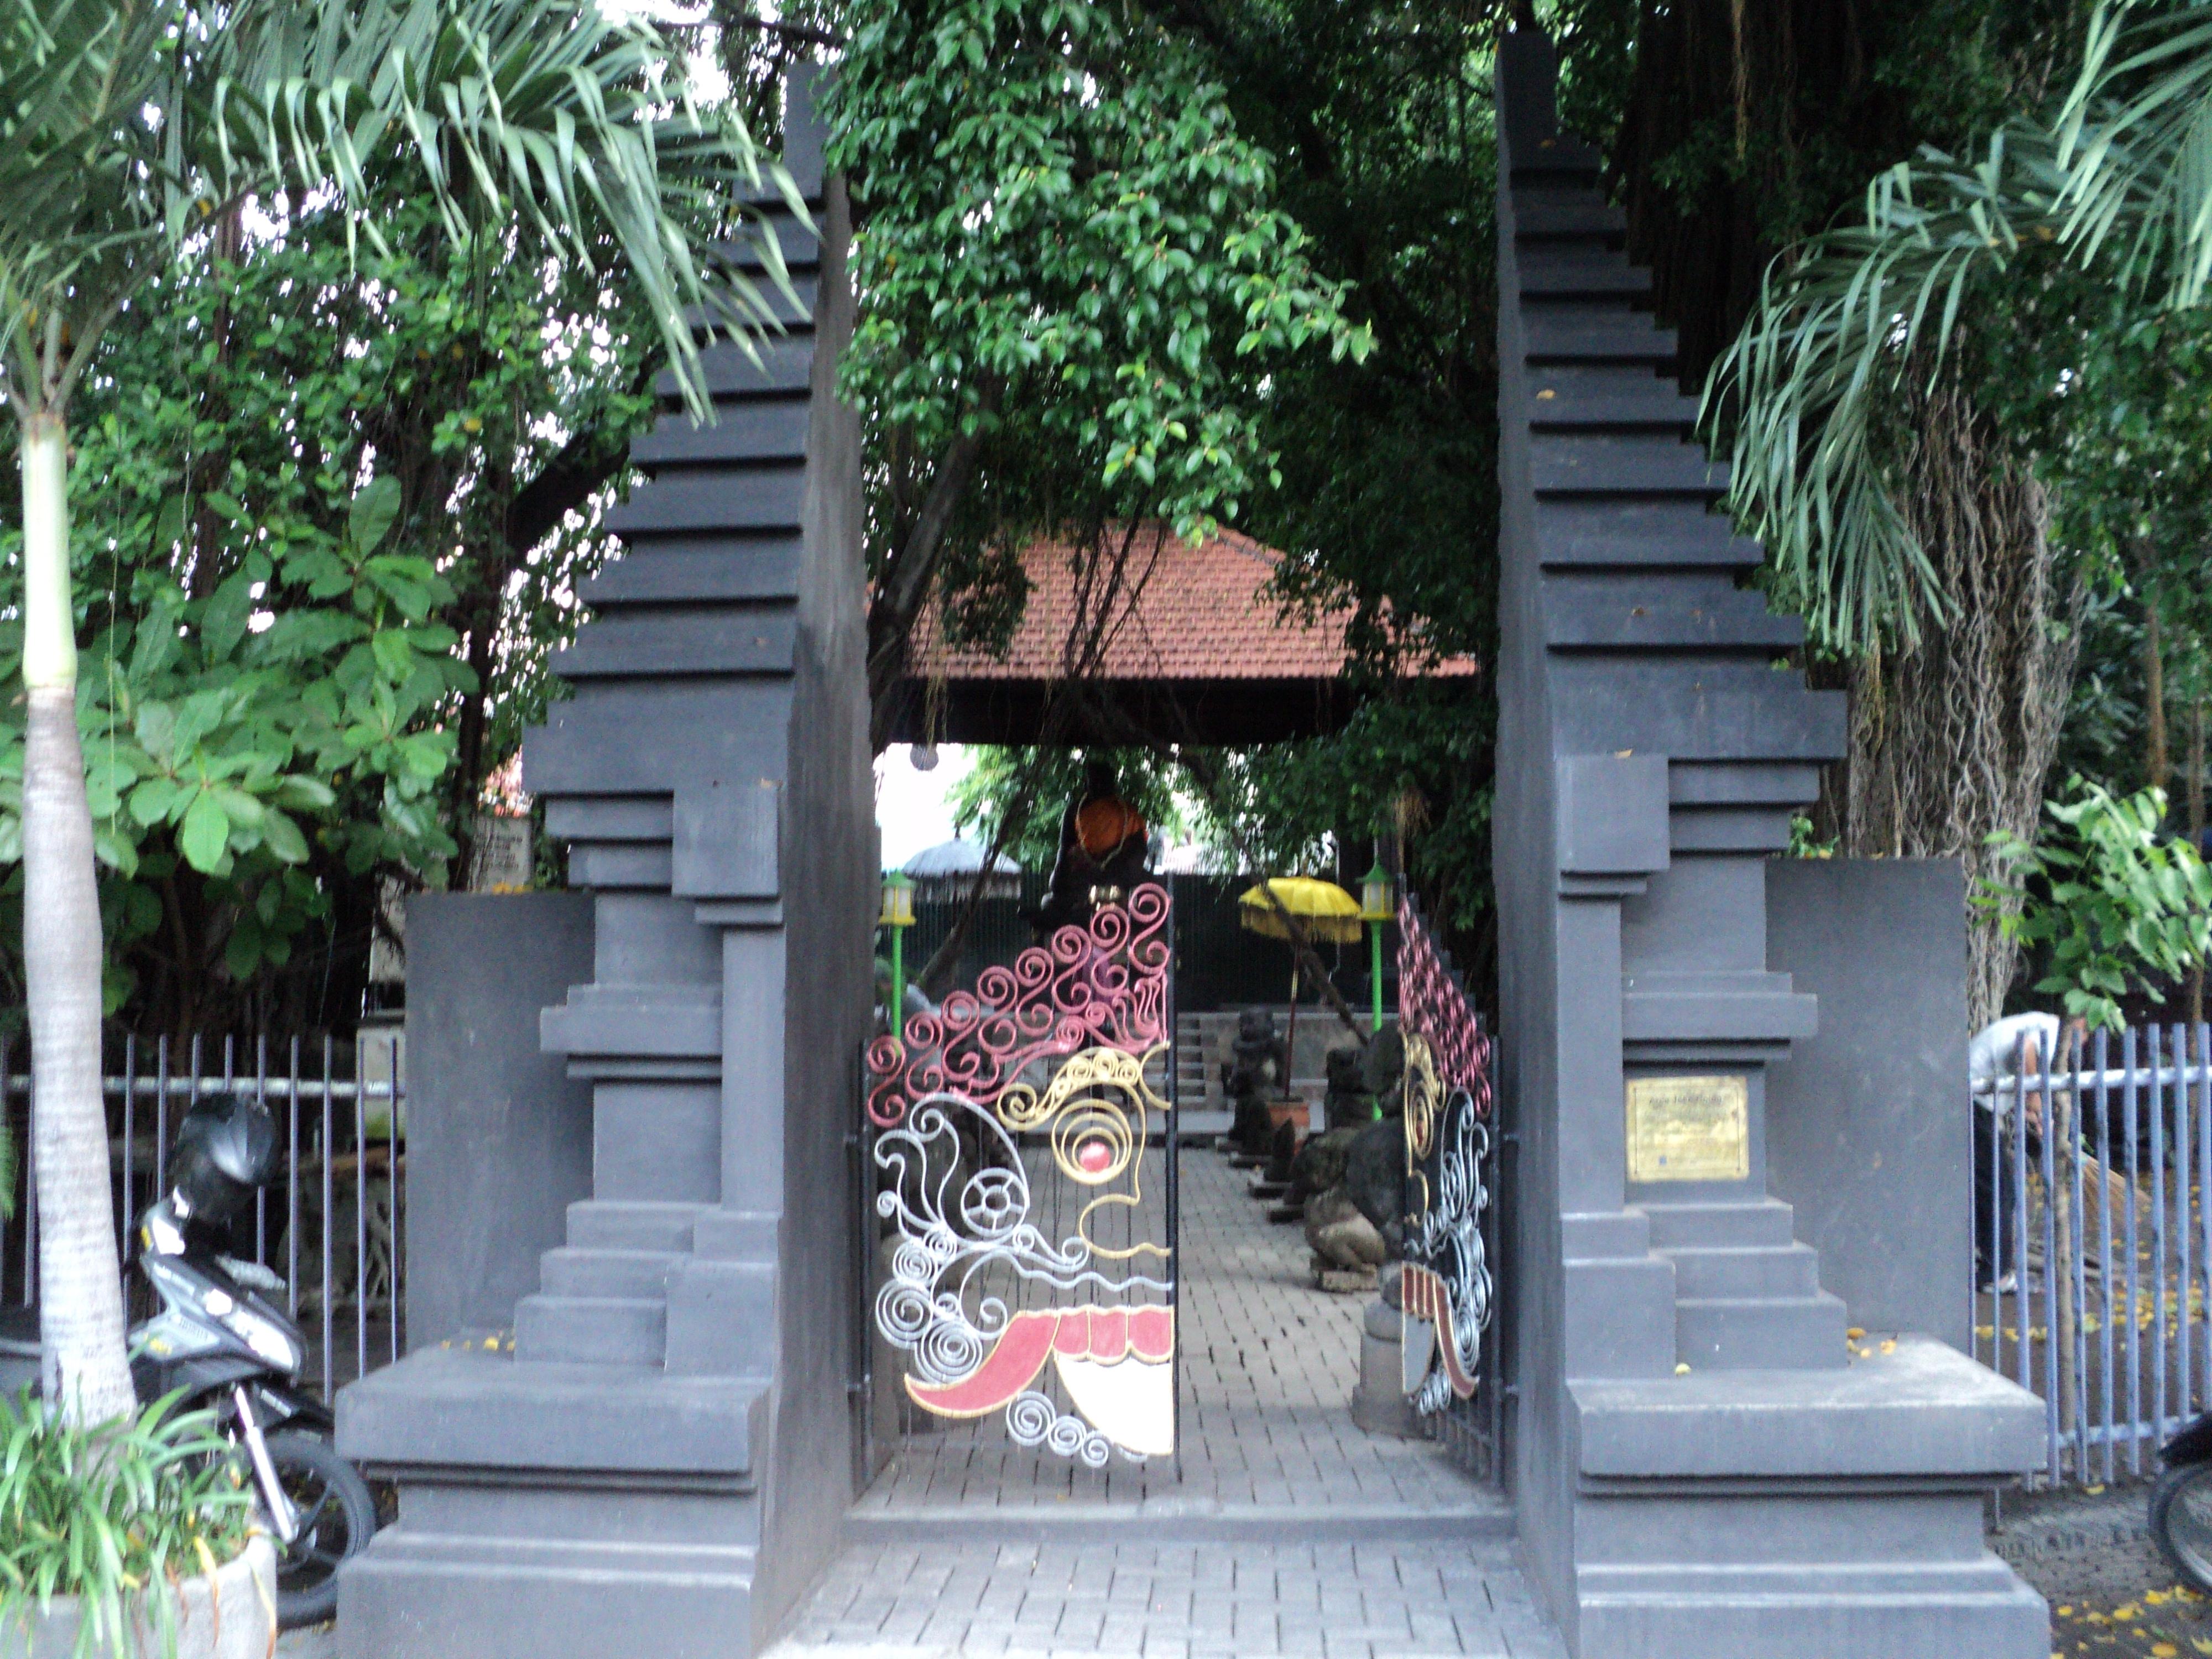 Galeri Foto Patung Joko Dolog Pesona Wisata Surabaya Arca Kota